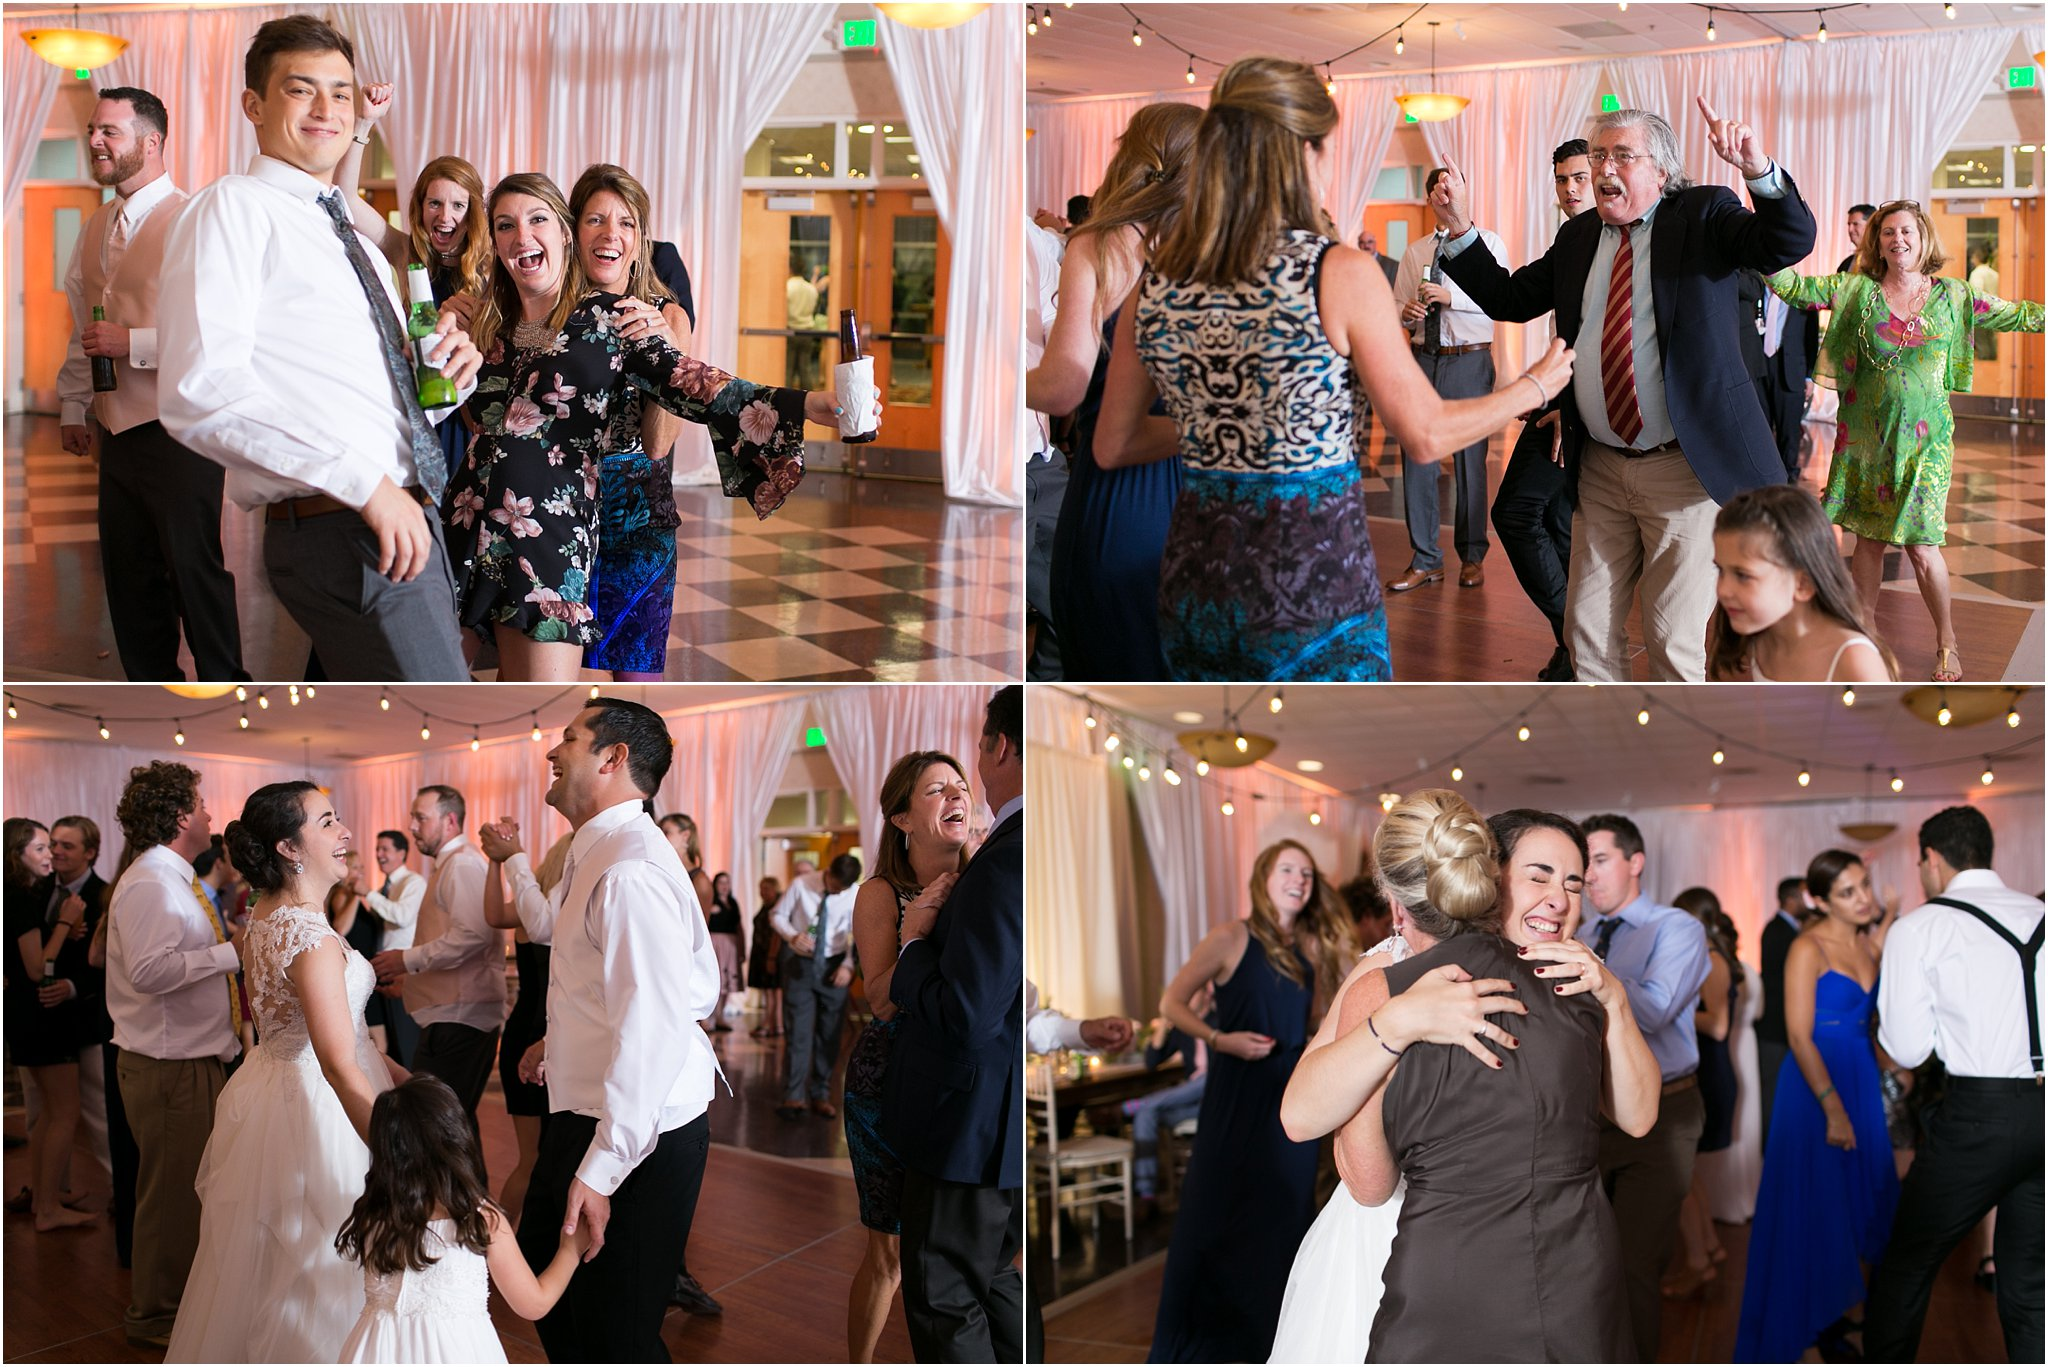 jessica_ryan_photography_virginia_wedding_photographer_wedding_hurricane_norfolk_botanical_gardens_hurricane_matthew_wedding_3642